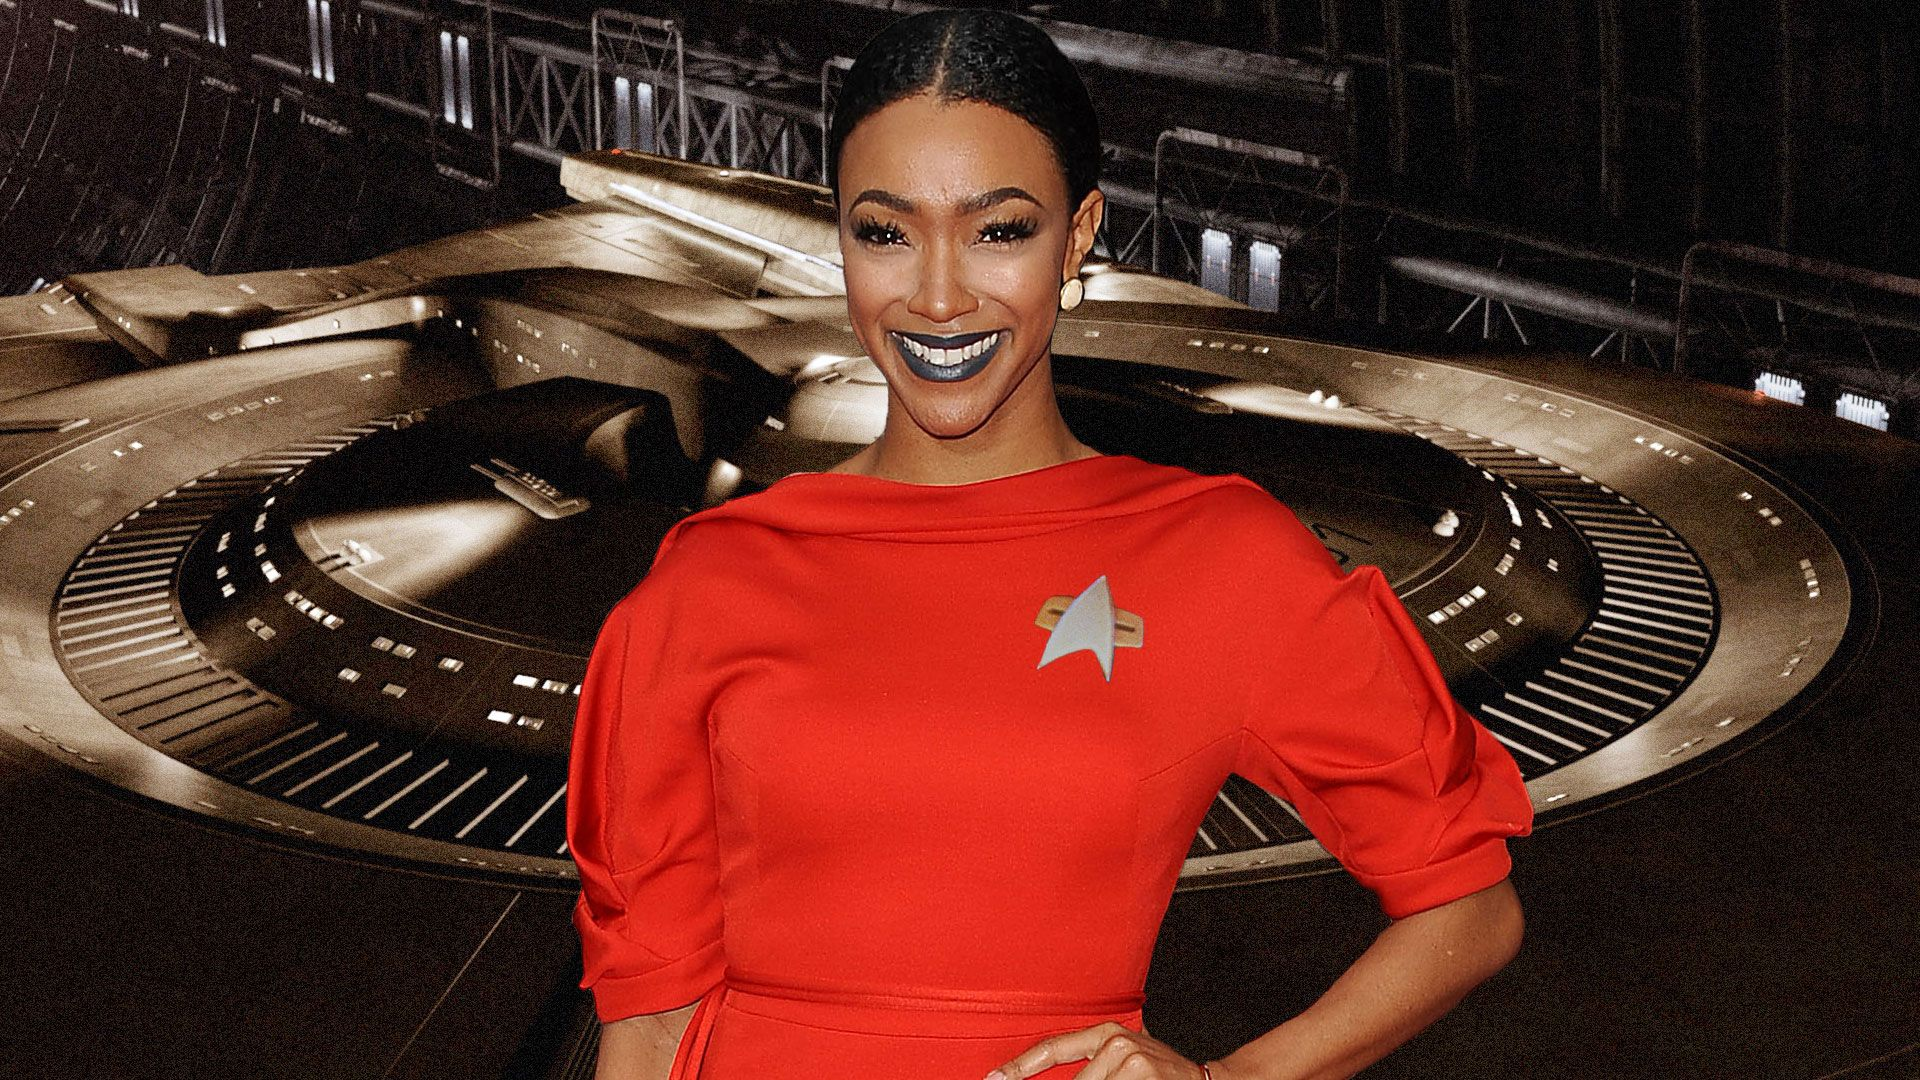 Sonequa Martin-Green, Star Trek, Photoshop